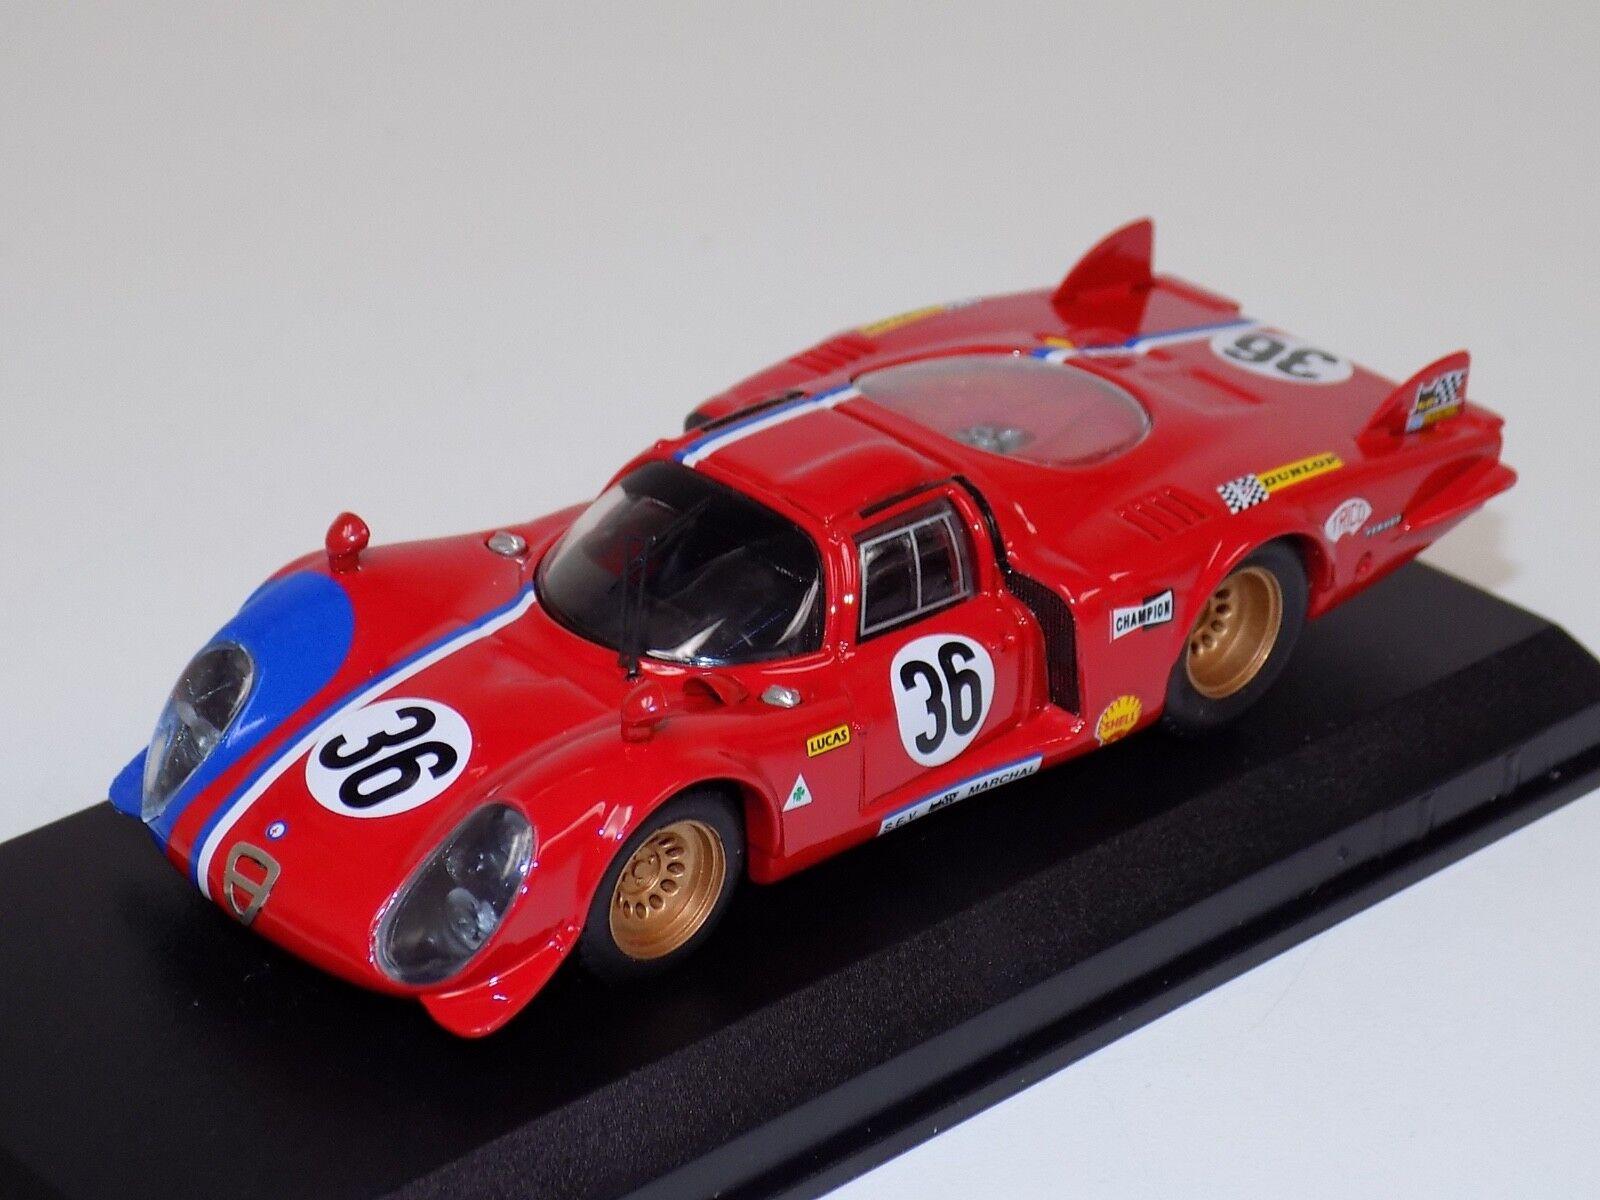 121 43 Best Model Alfa Romeo Romeo Romeo 33.2 Car from 1969 24 H of LeMans e47692